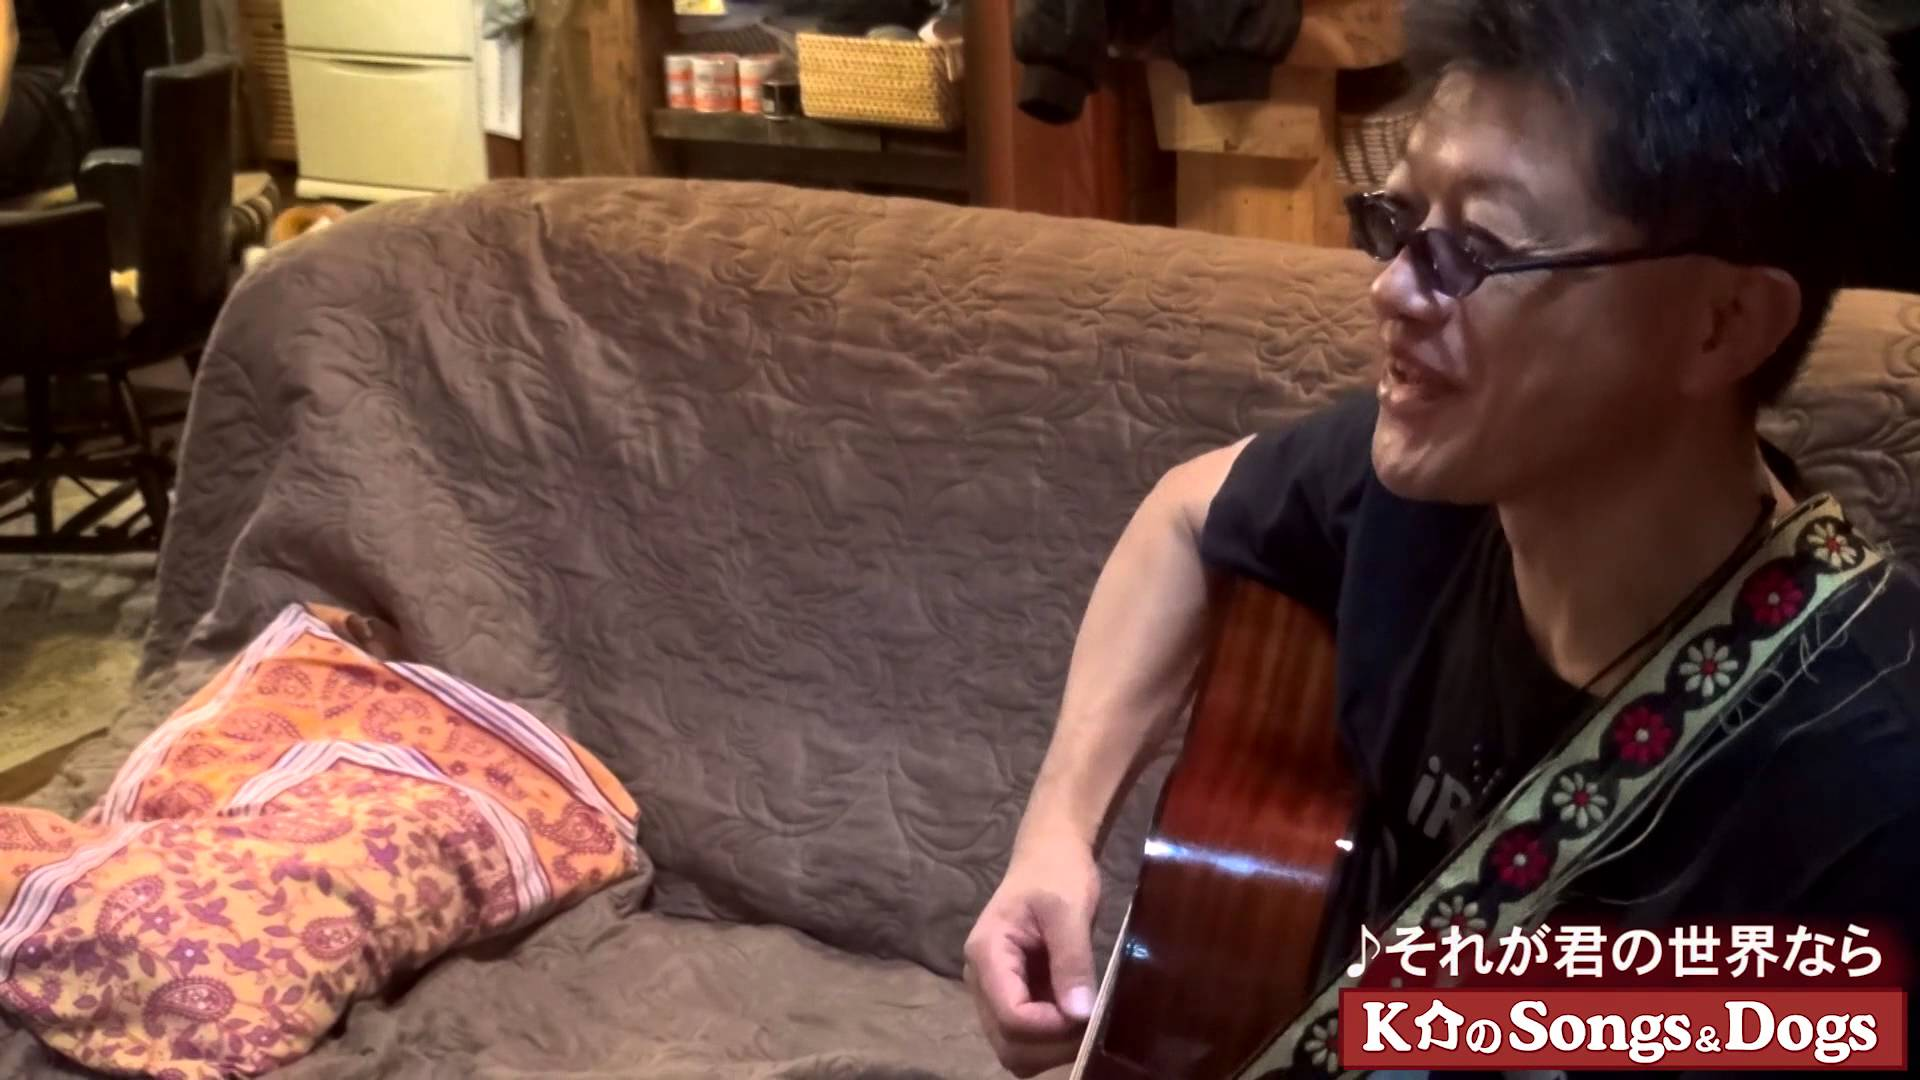 K介のSongs&Dogs週末はミュージシャン86